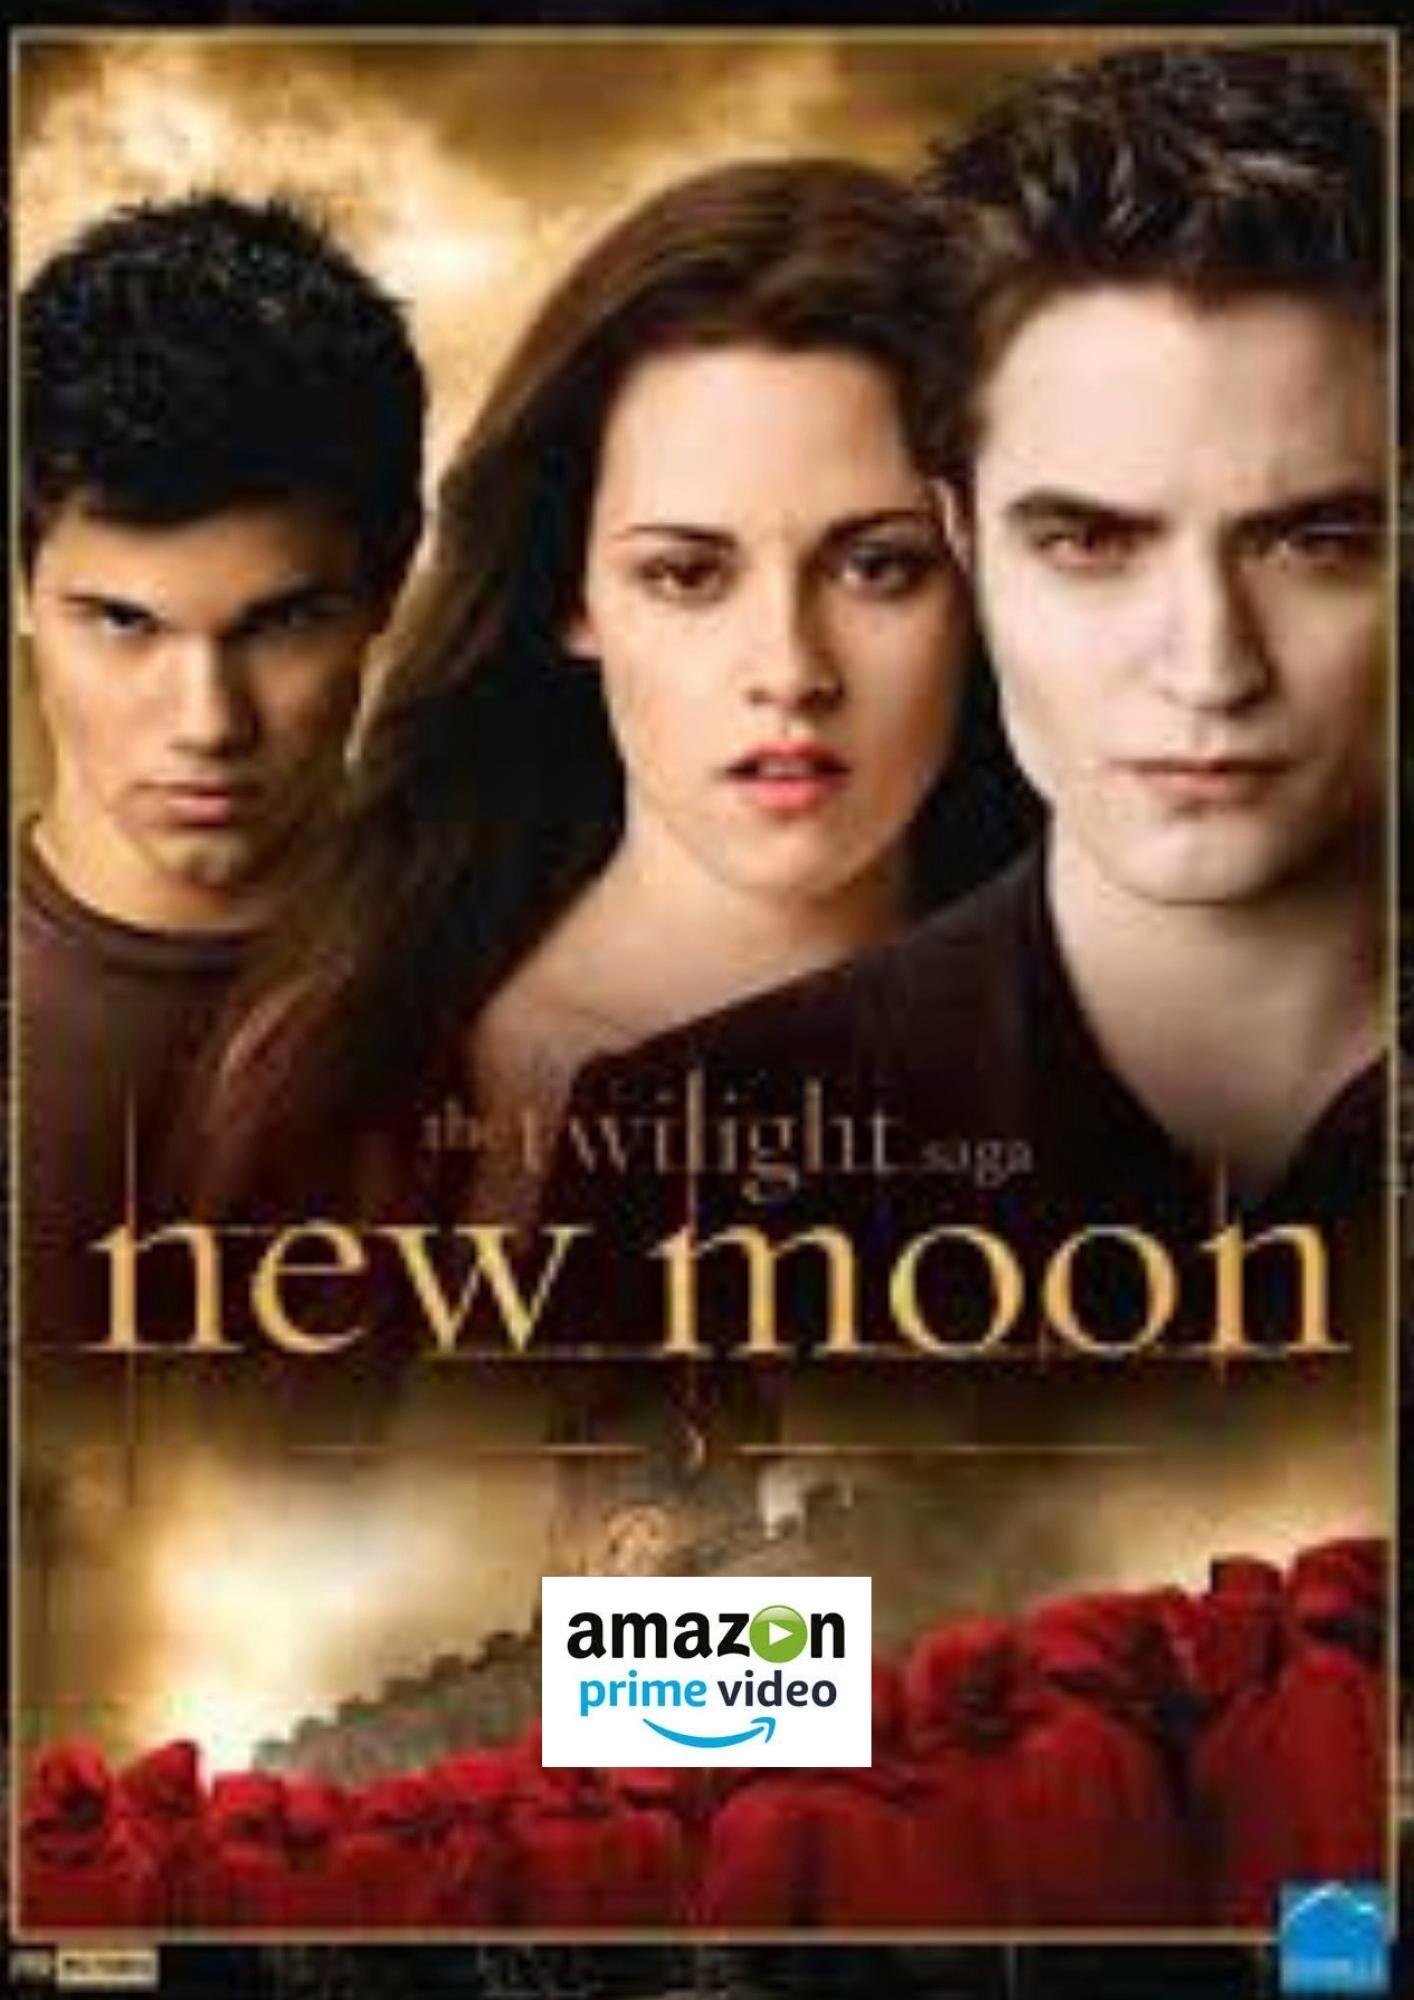 The Twilight Saga New Moon Video Twilight Saga New Moon Twilight Saga New Moon Movie